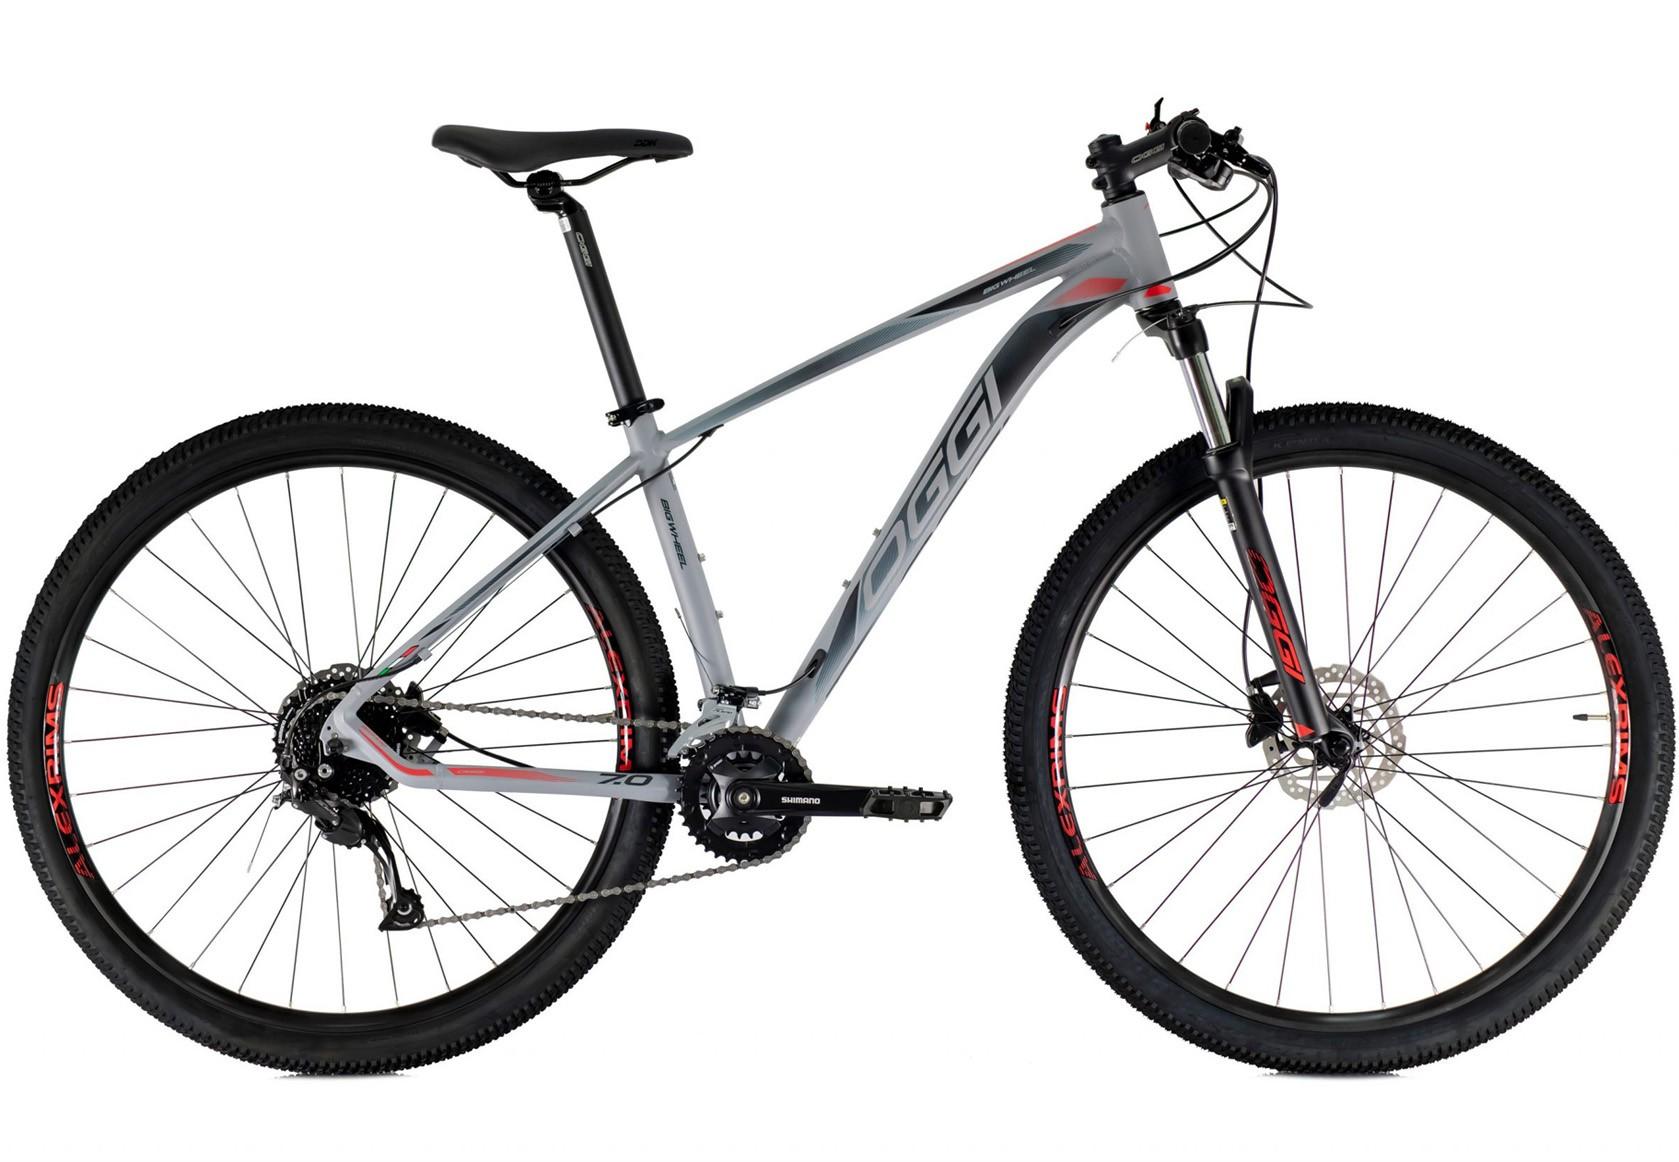 BICICLETA 29 OGGI BIG WHEEL 7.0 ALIVIO 2X9 VEL. GRAF/PTO/VERMELHO  (2021)